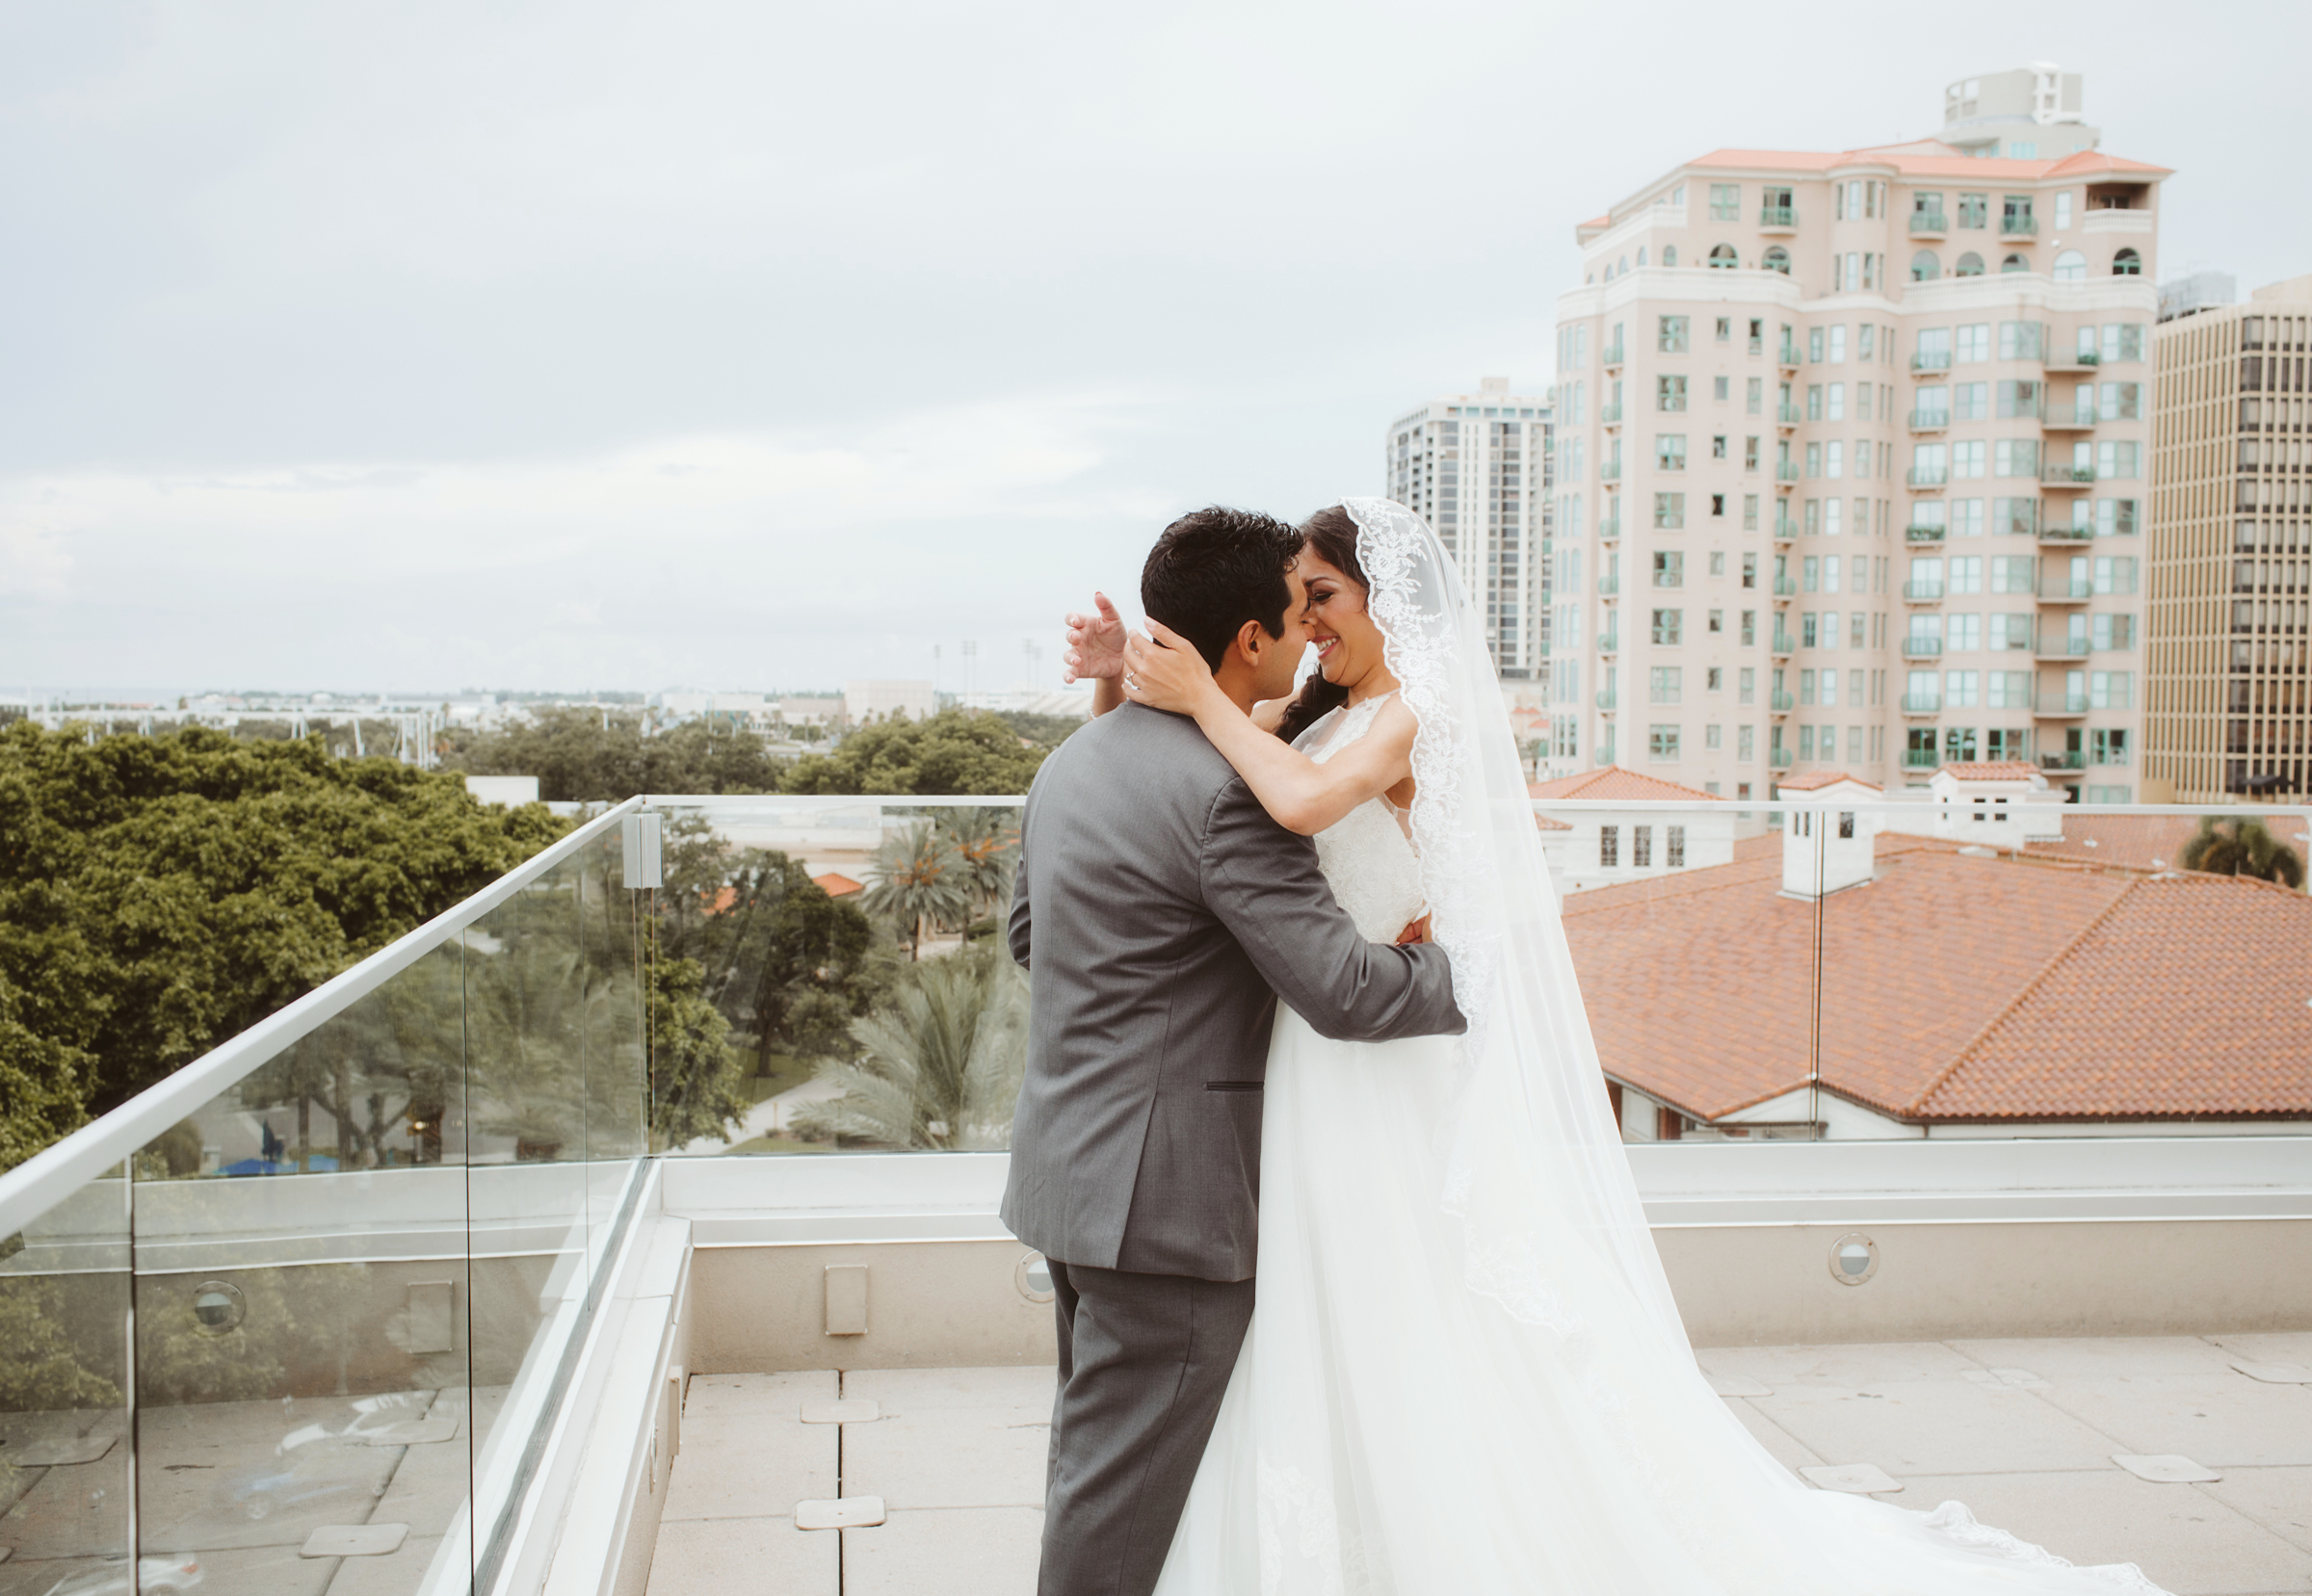 wedding day | MFA St Pete | Vanessa Boy Photography | vanessaboy.com-148.com |final.jpg